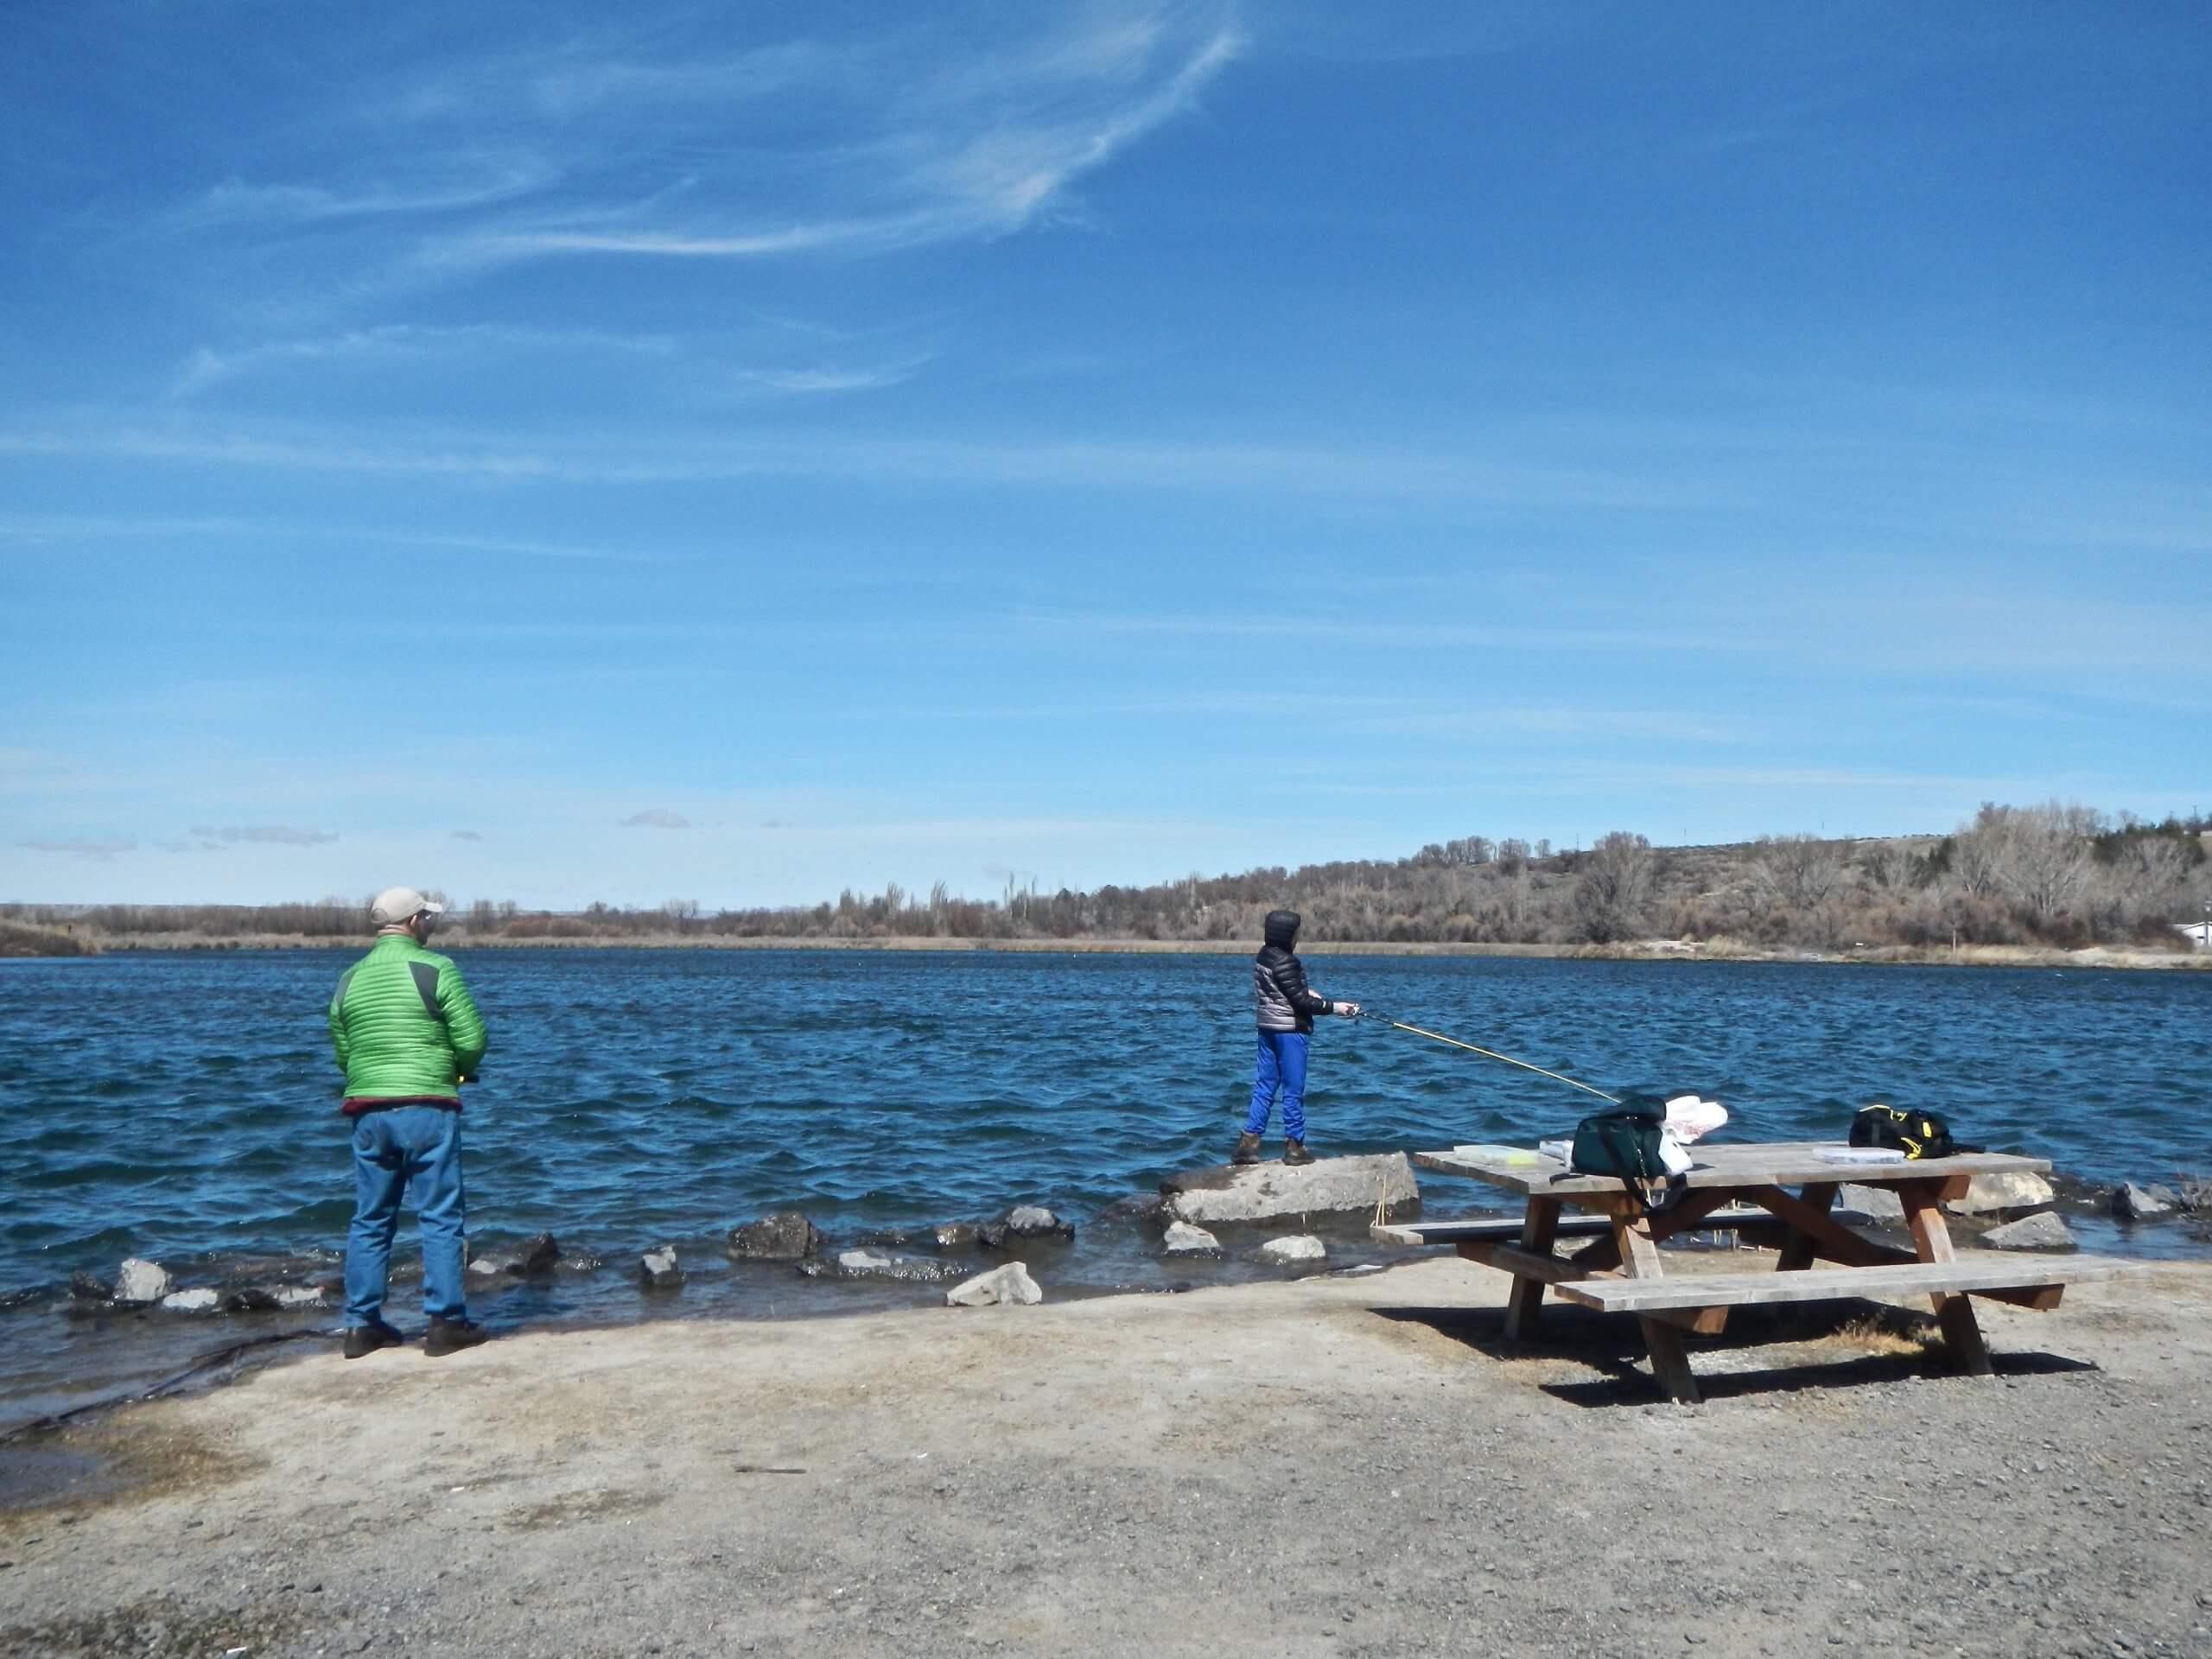 Enjoy year-round fishing at Oster Lakes. Photo Credit: Mike McKenna.